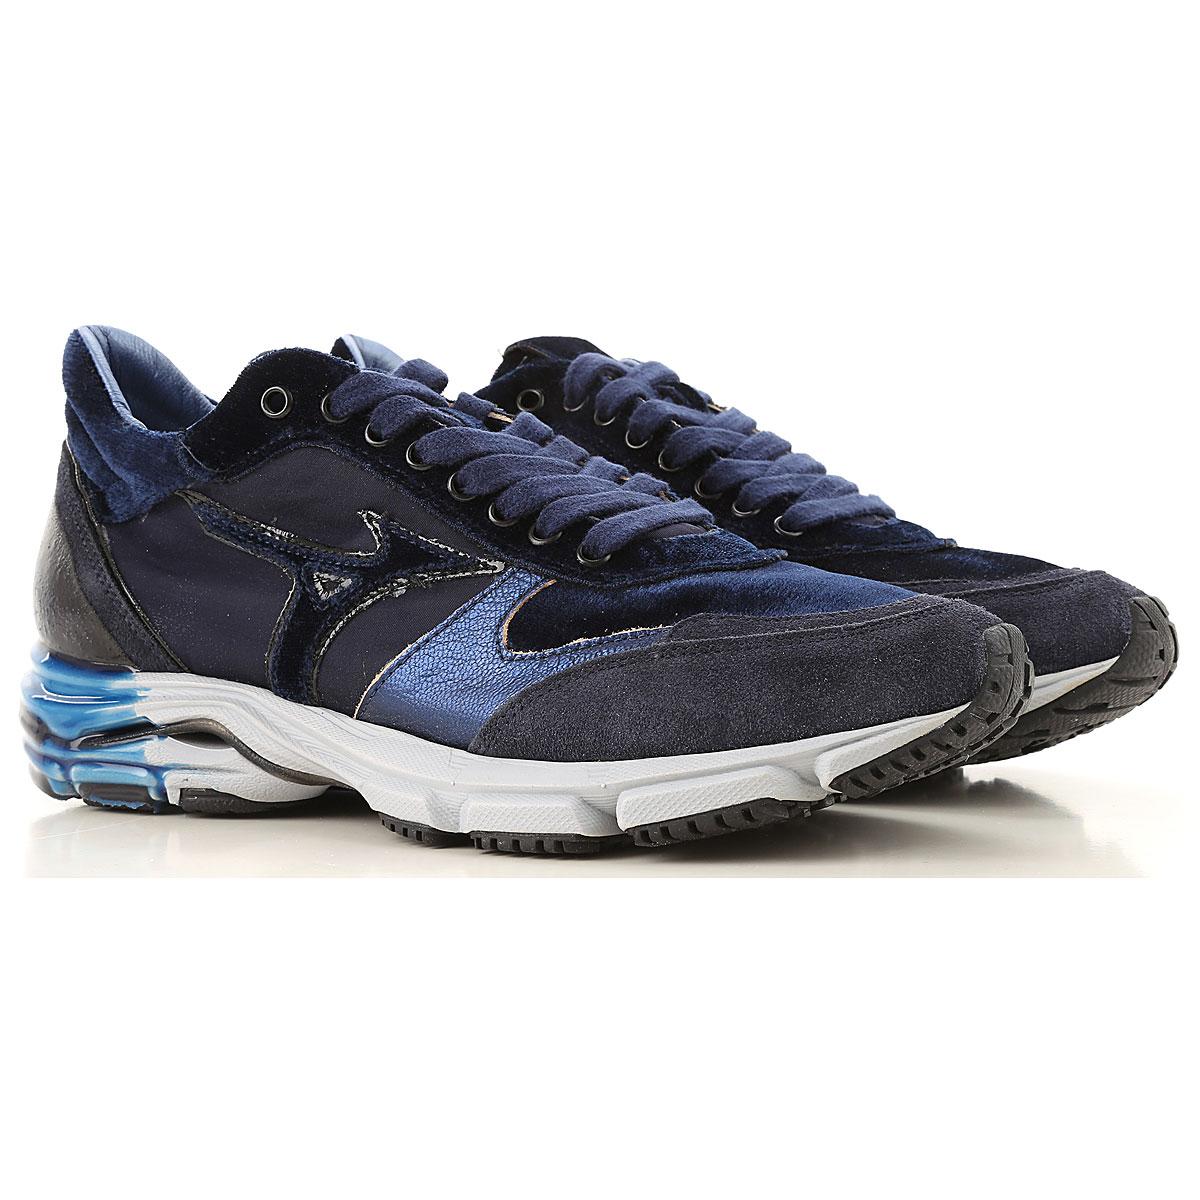 Mizuno Sneakers for Men On Sale in Outlet, Dark Blue, Suede leather, 2019, US 7 5 - UK 6 5 - EU 40 - JP 25.5 US 8 5 - UK 7.5 - EU 41 - JP 26 5